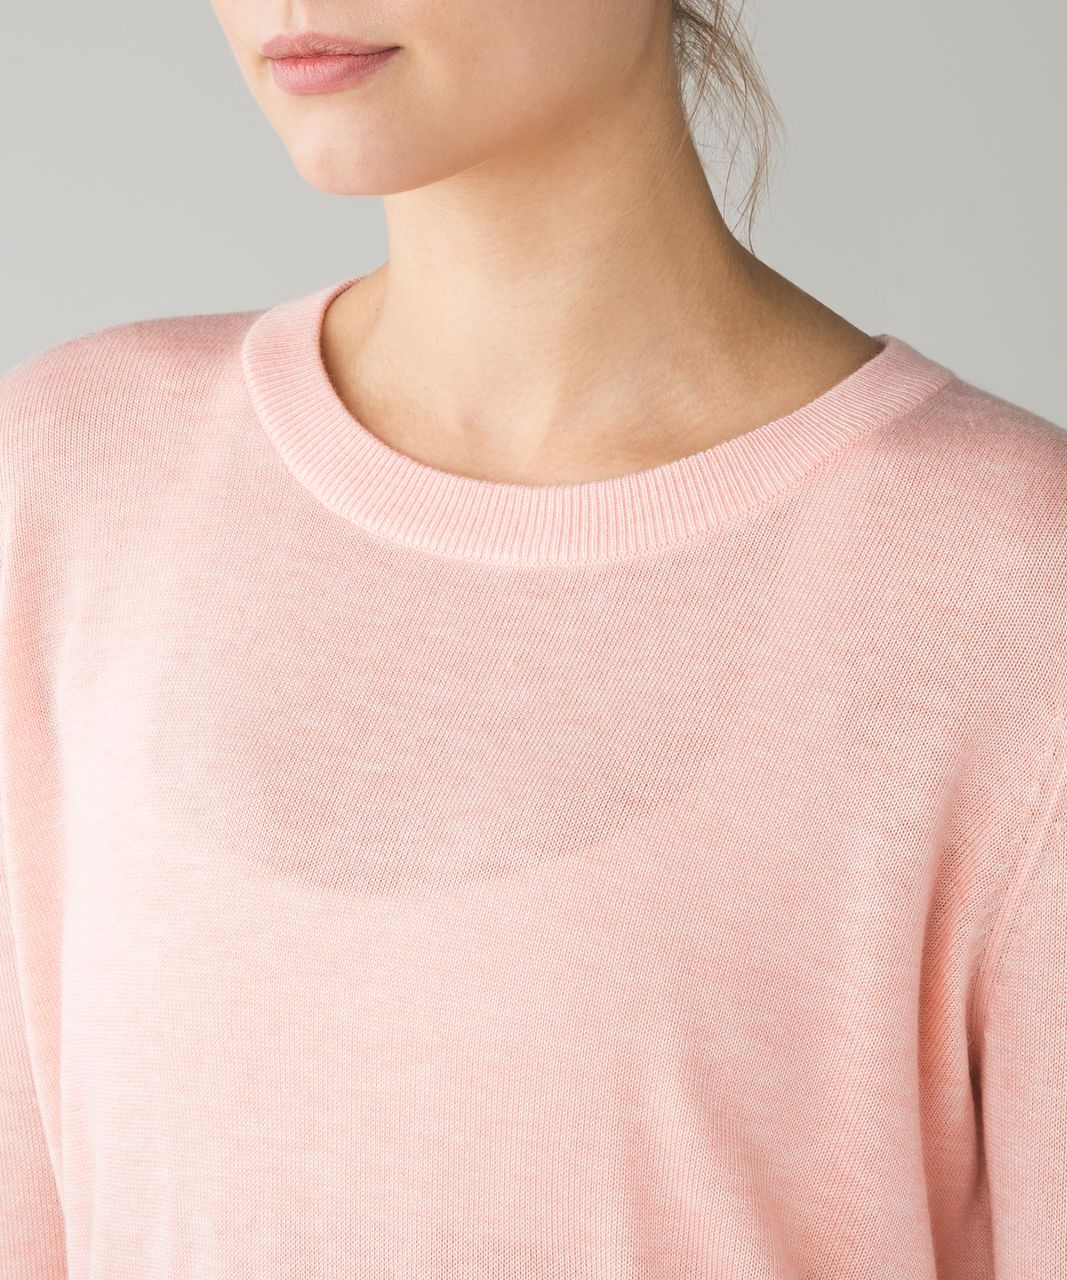 Lululemon Bring It Backbend Sweater - Heathered Minty Pink